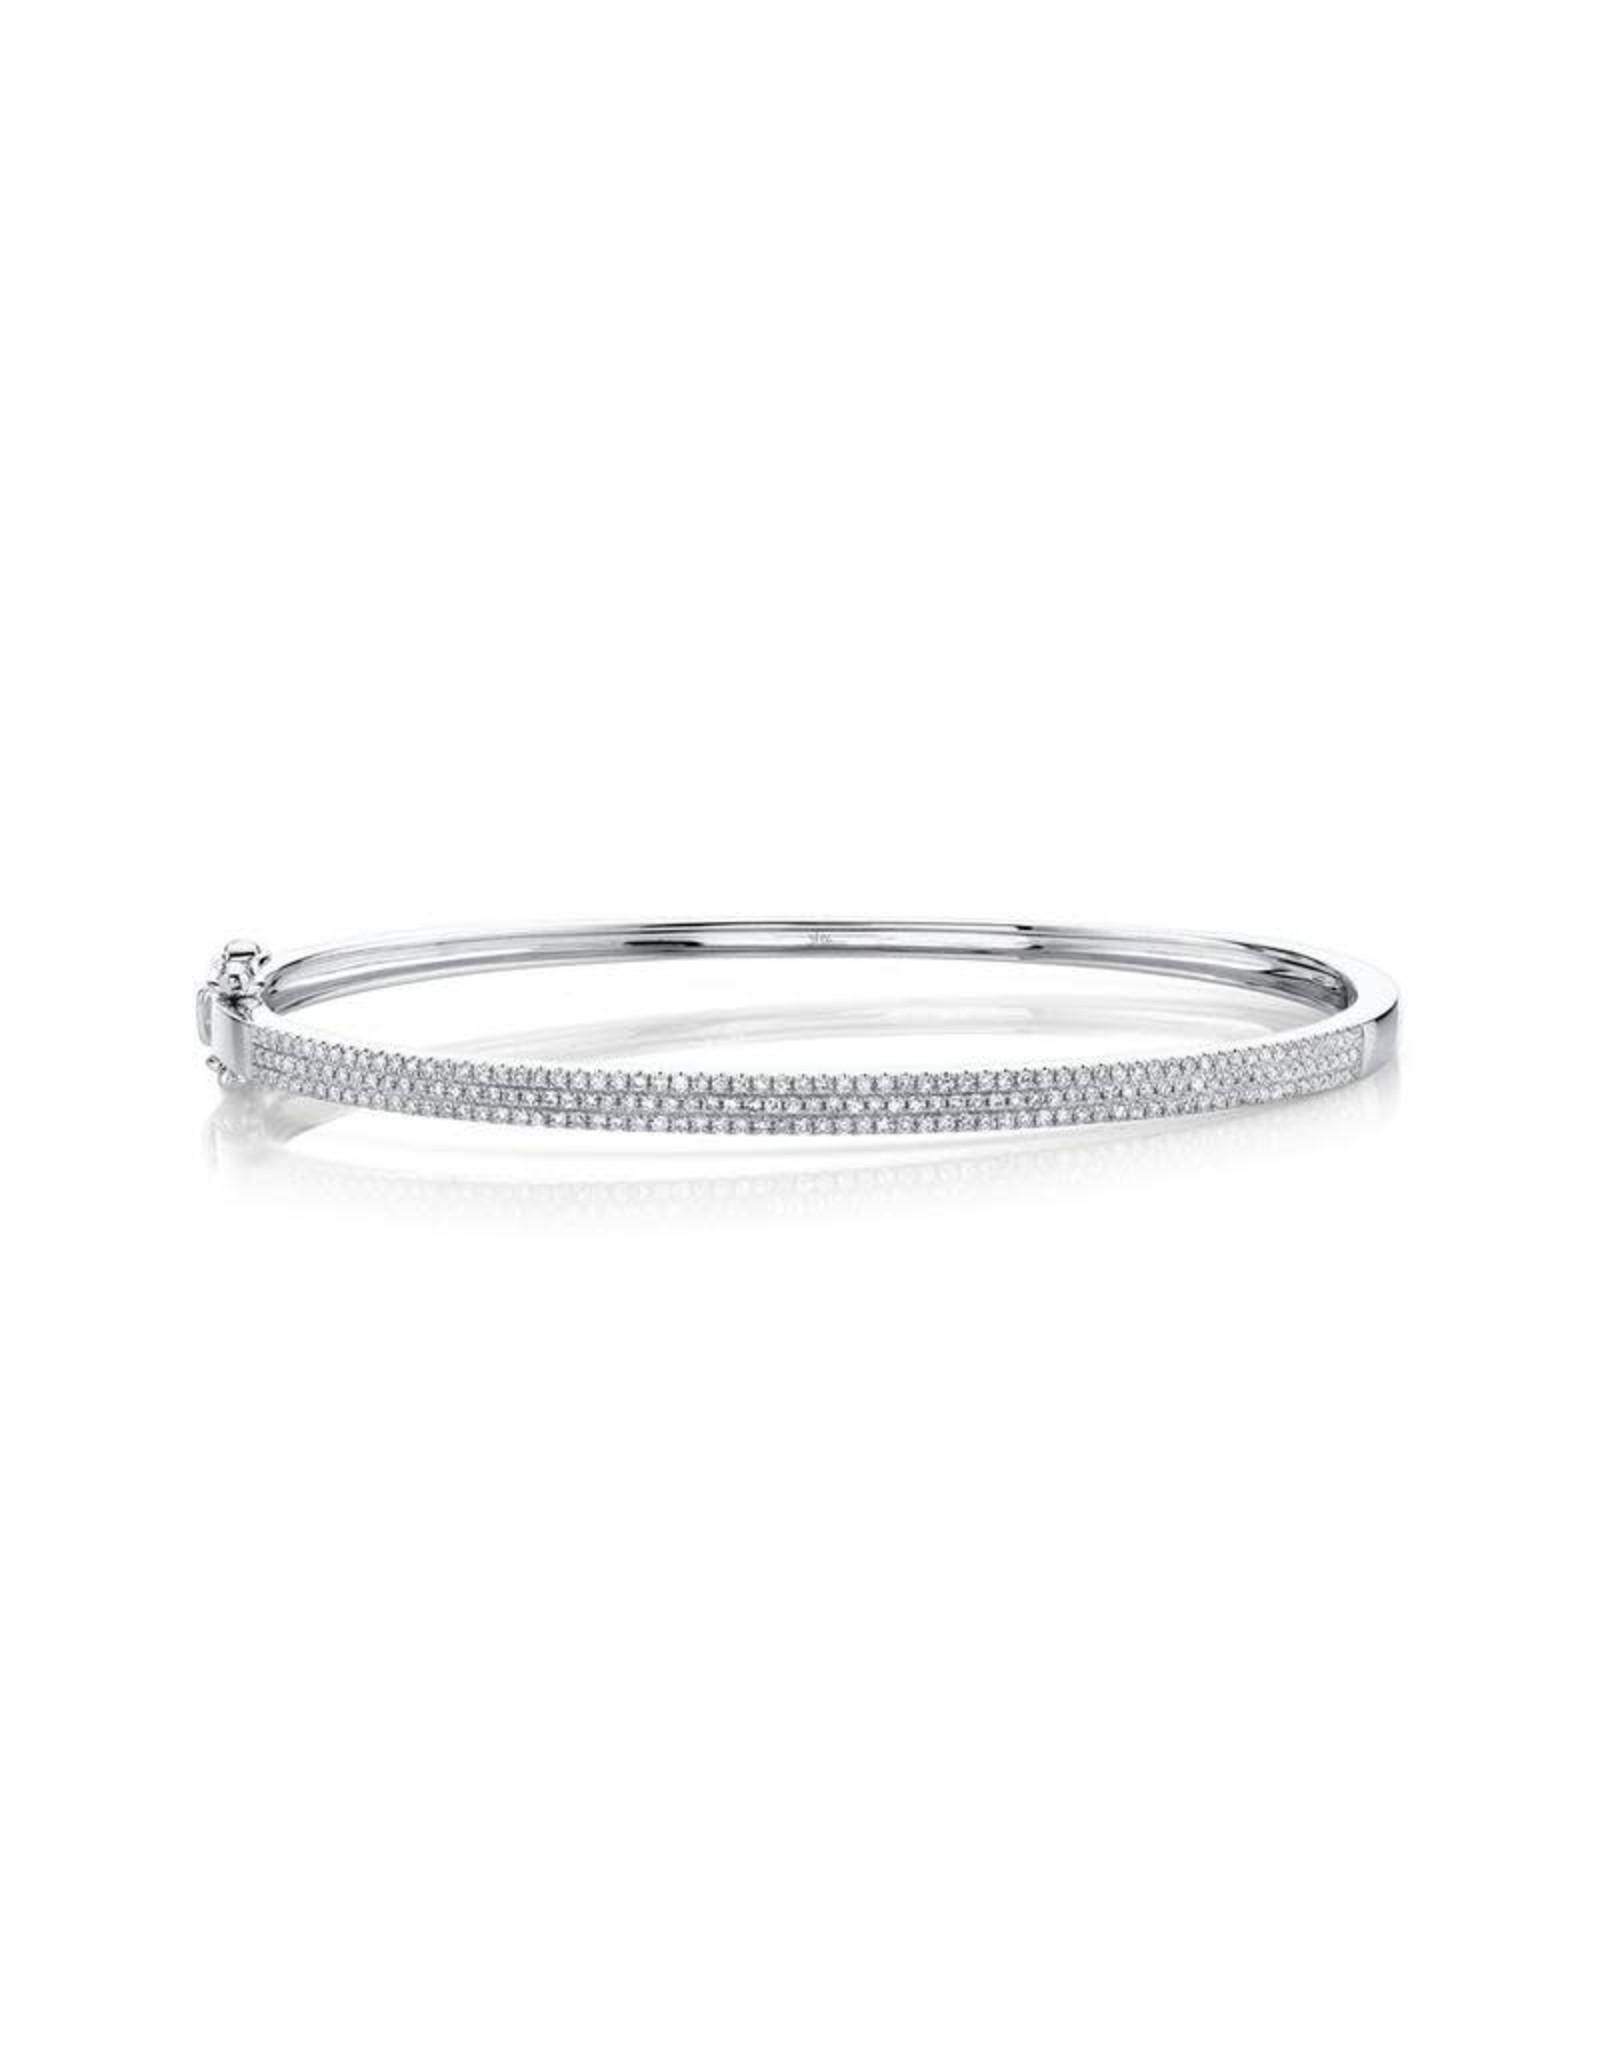 14K White Gold Pave Diamond Bangle Bracelet, D: 0.52ct